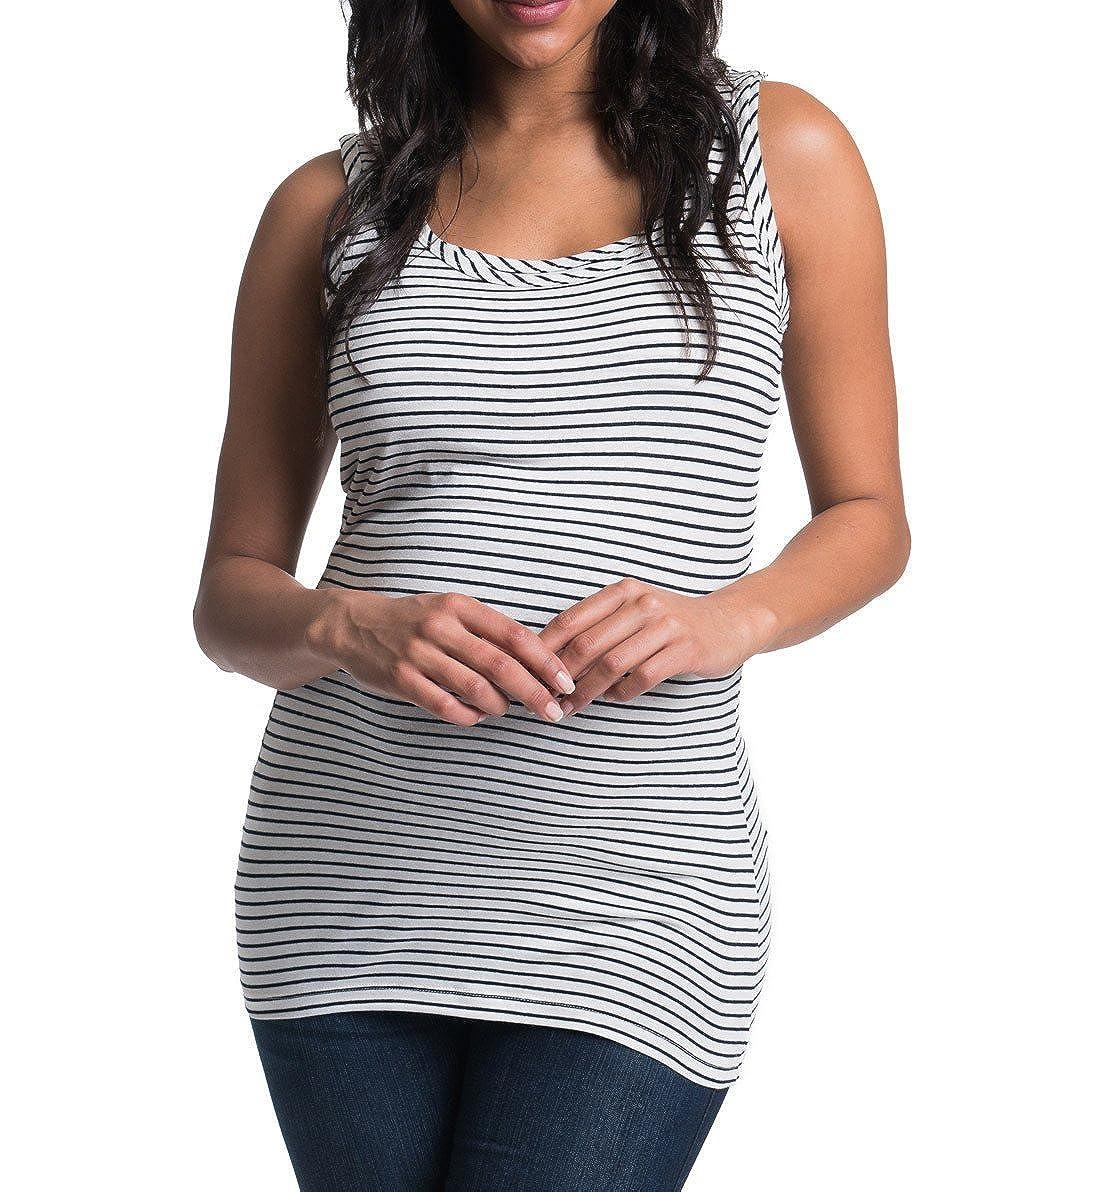 9a913f8a84d72 BUN Pencil Stripe Maternity / Nursing Tank #B7014, XL 14-16, Navy/Ivory at Amazon  Women's Clothing store: